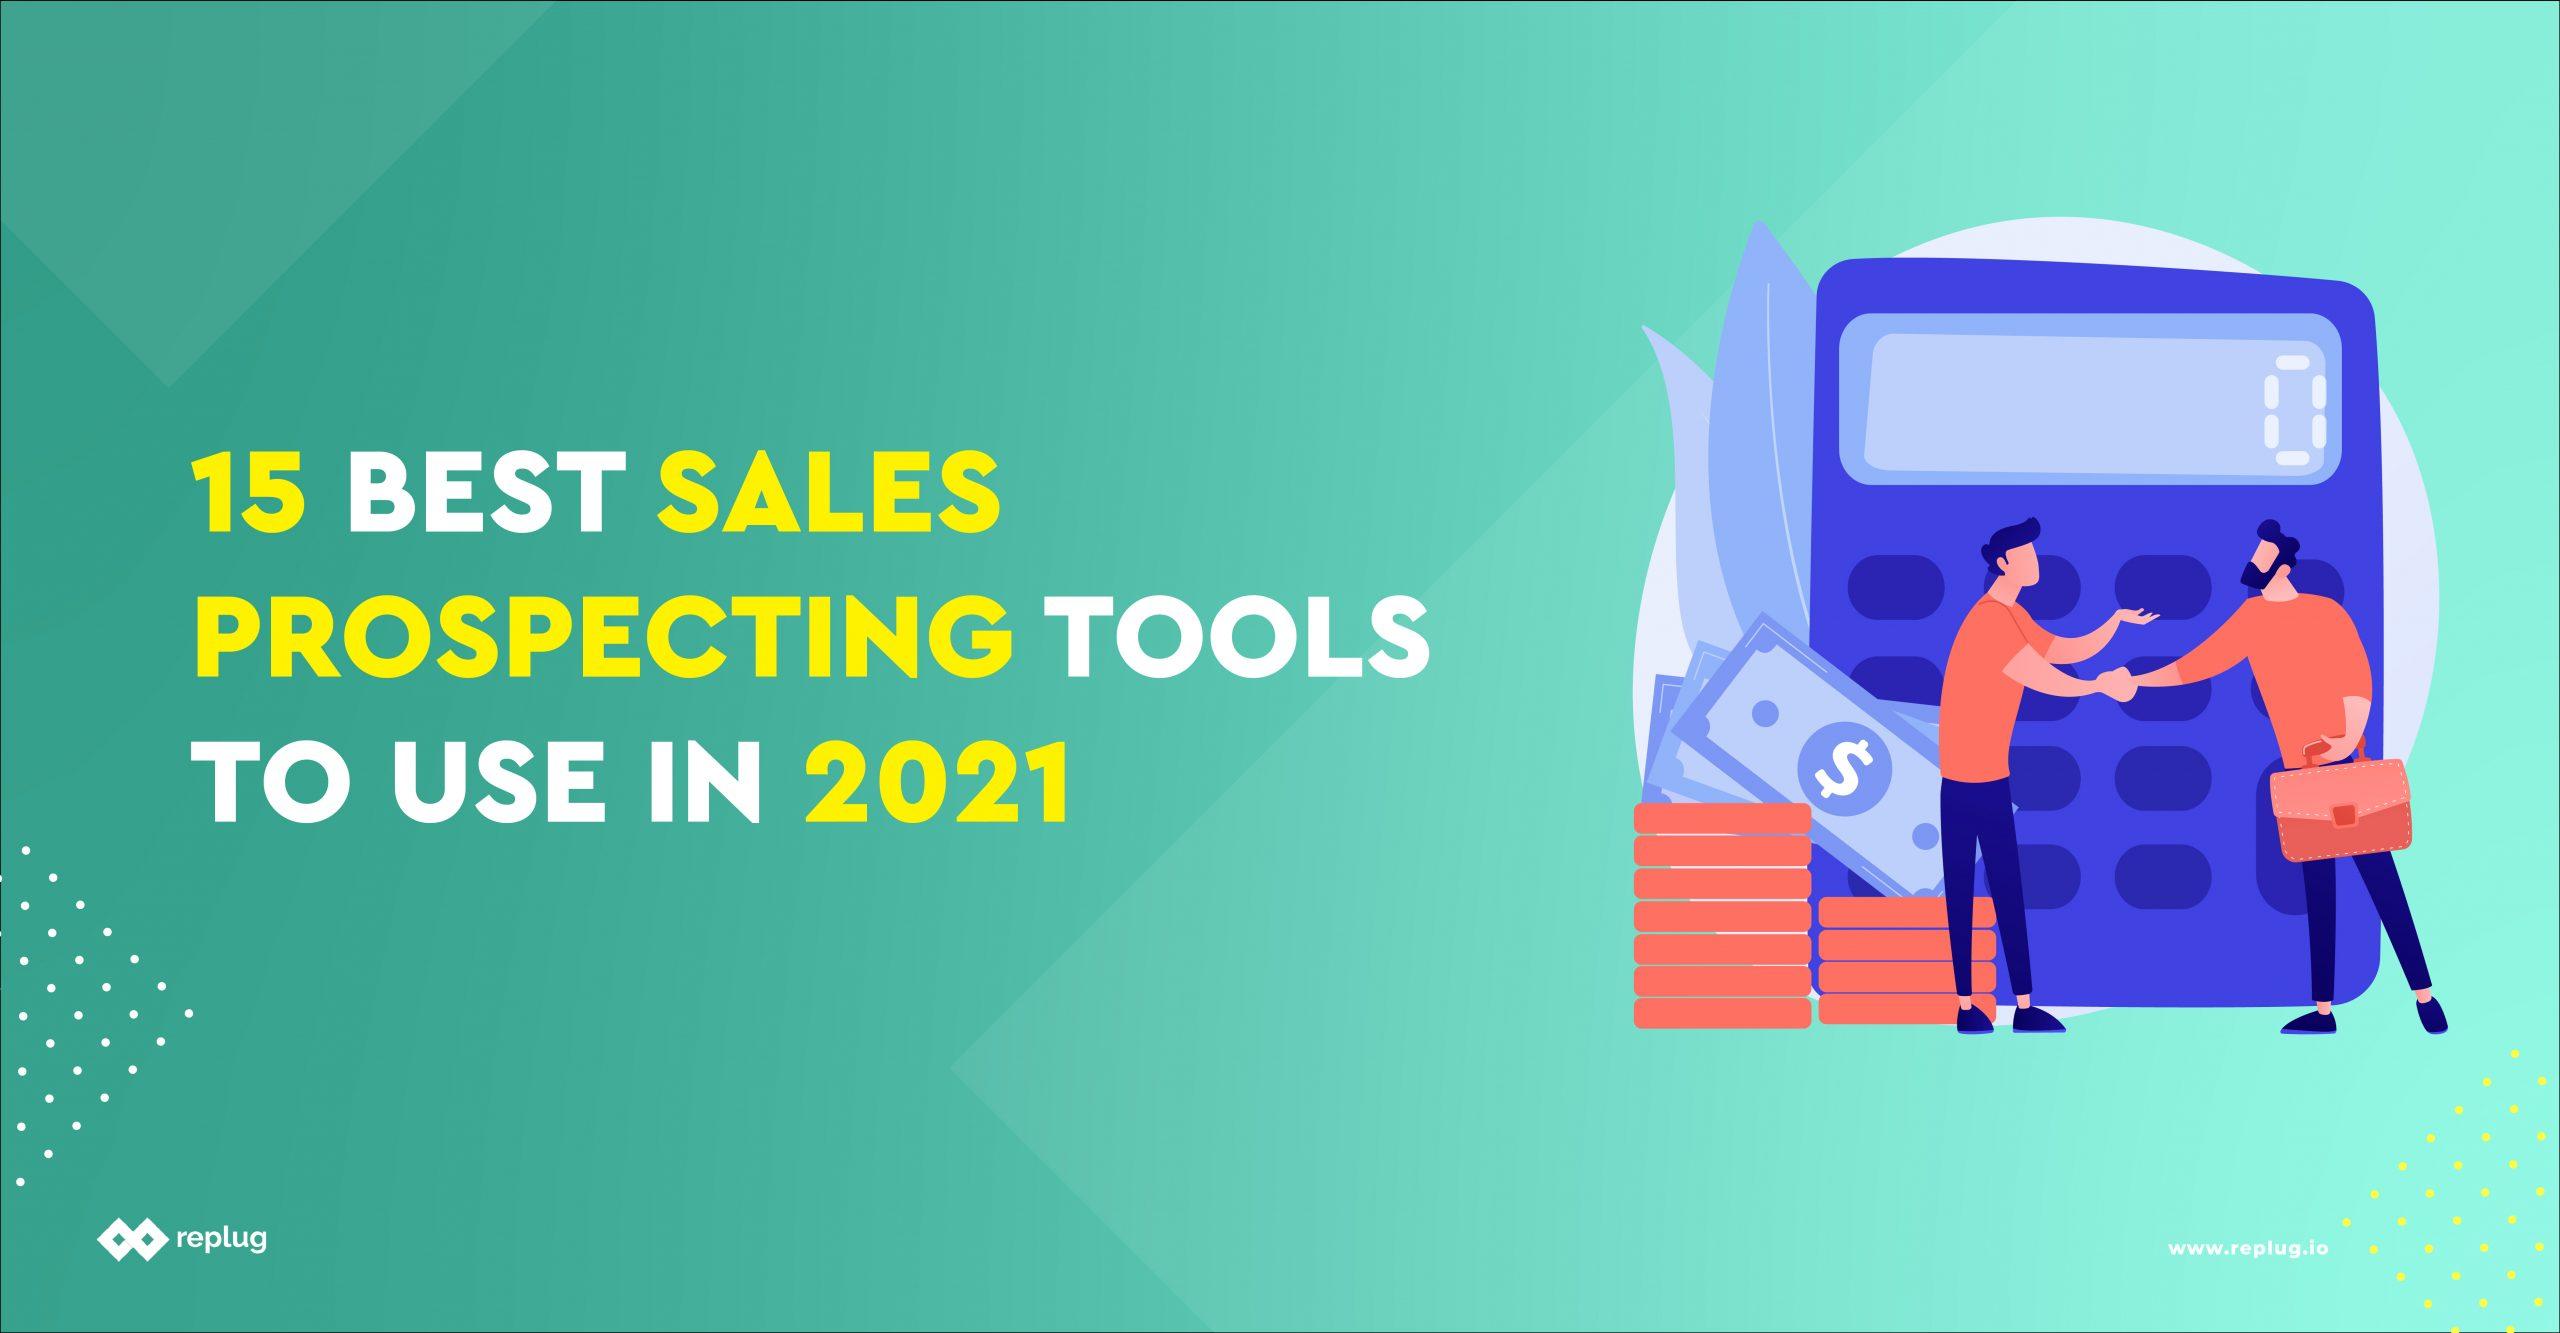 Best Sales Prospecting tools 2021